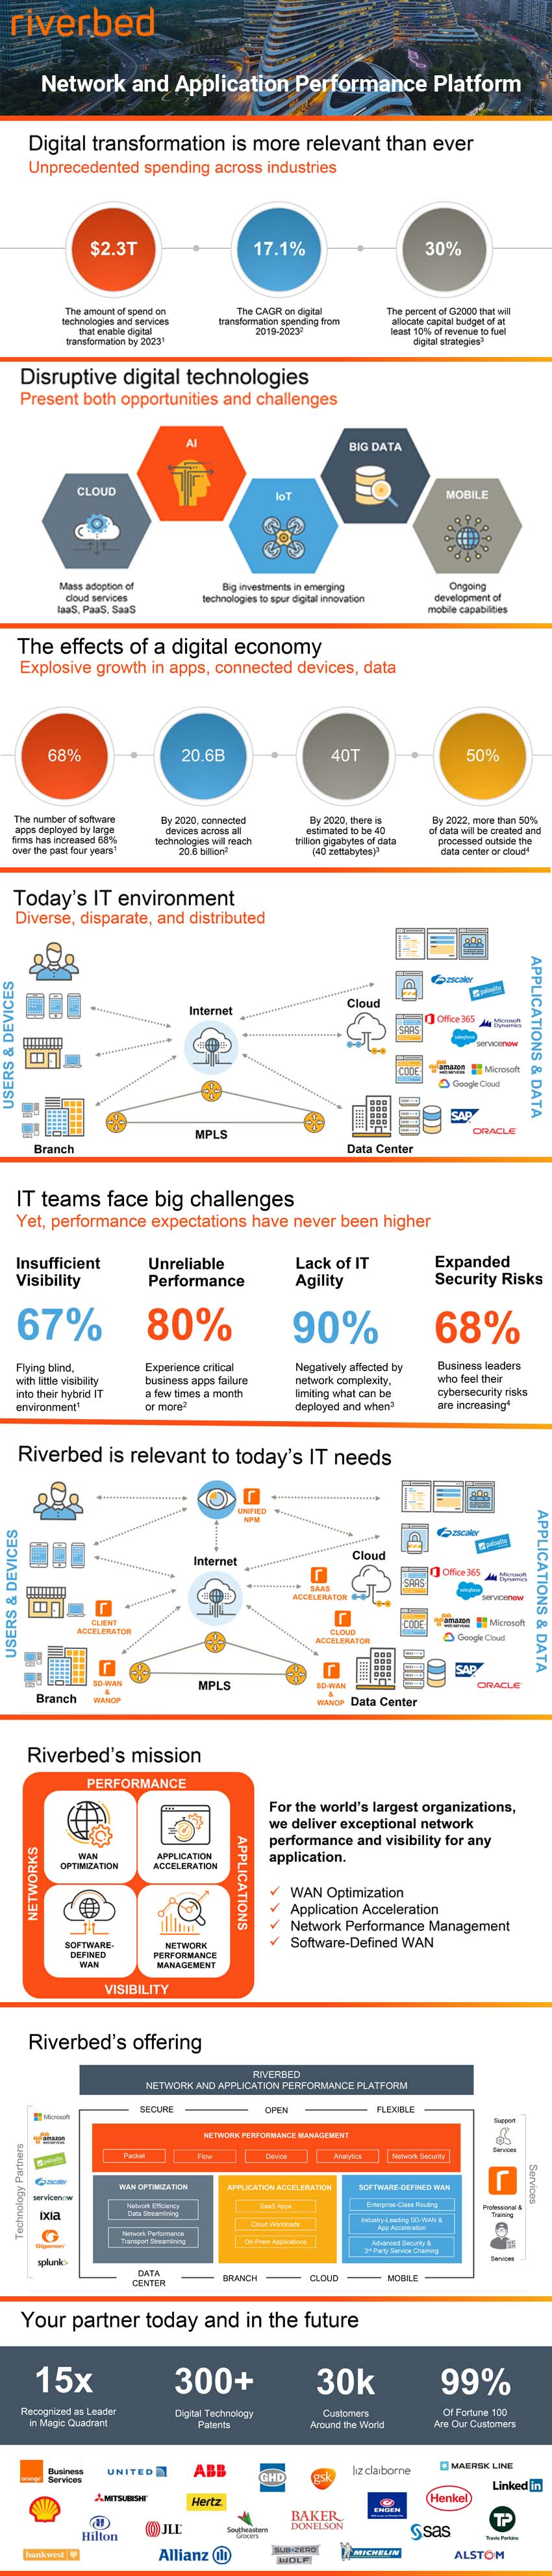 Network and Application Performance Platform